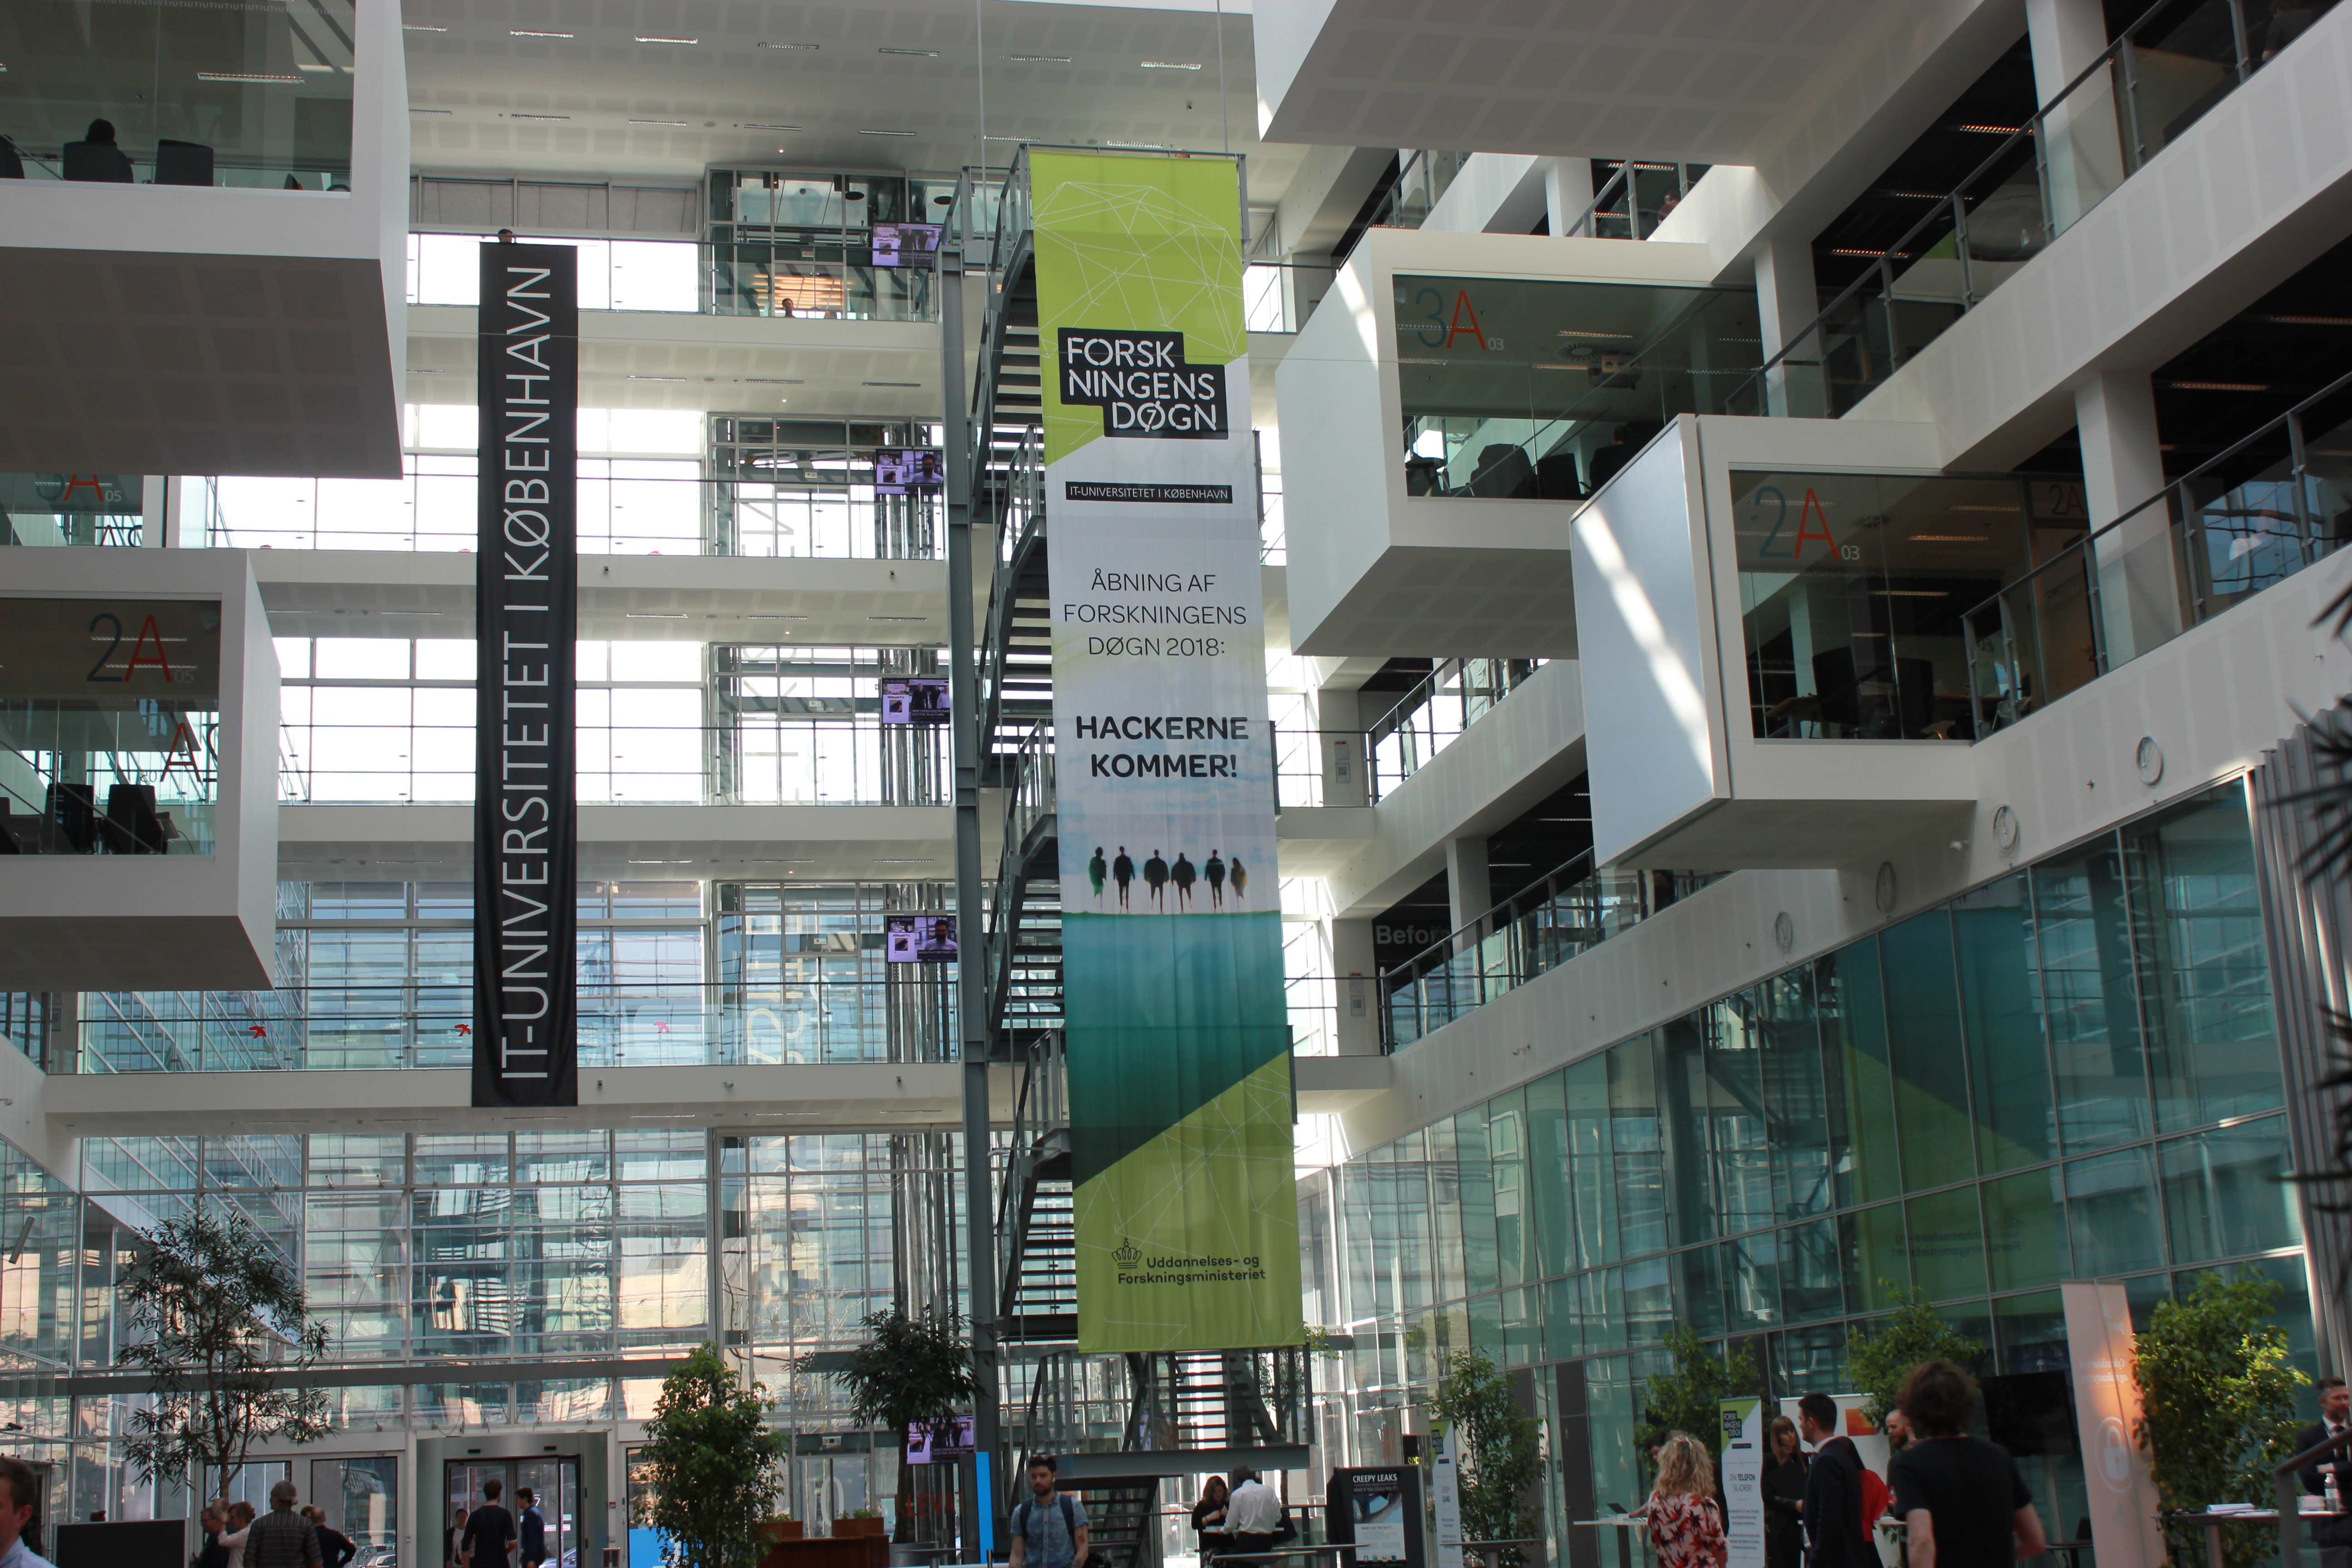 ITU, hacking, forskningsensdøgn